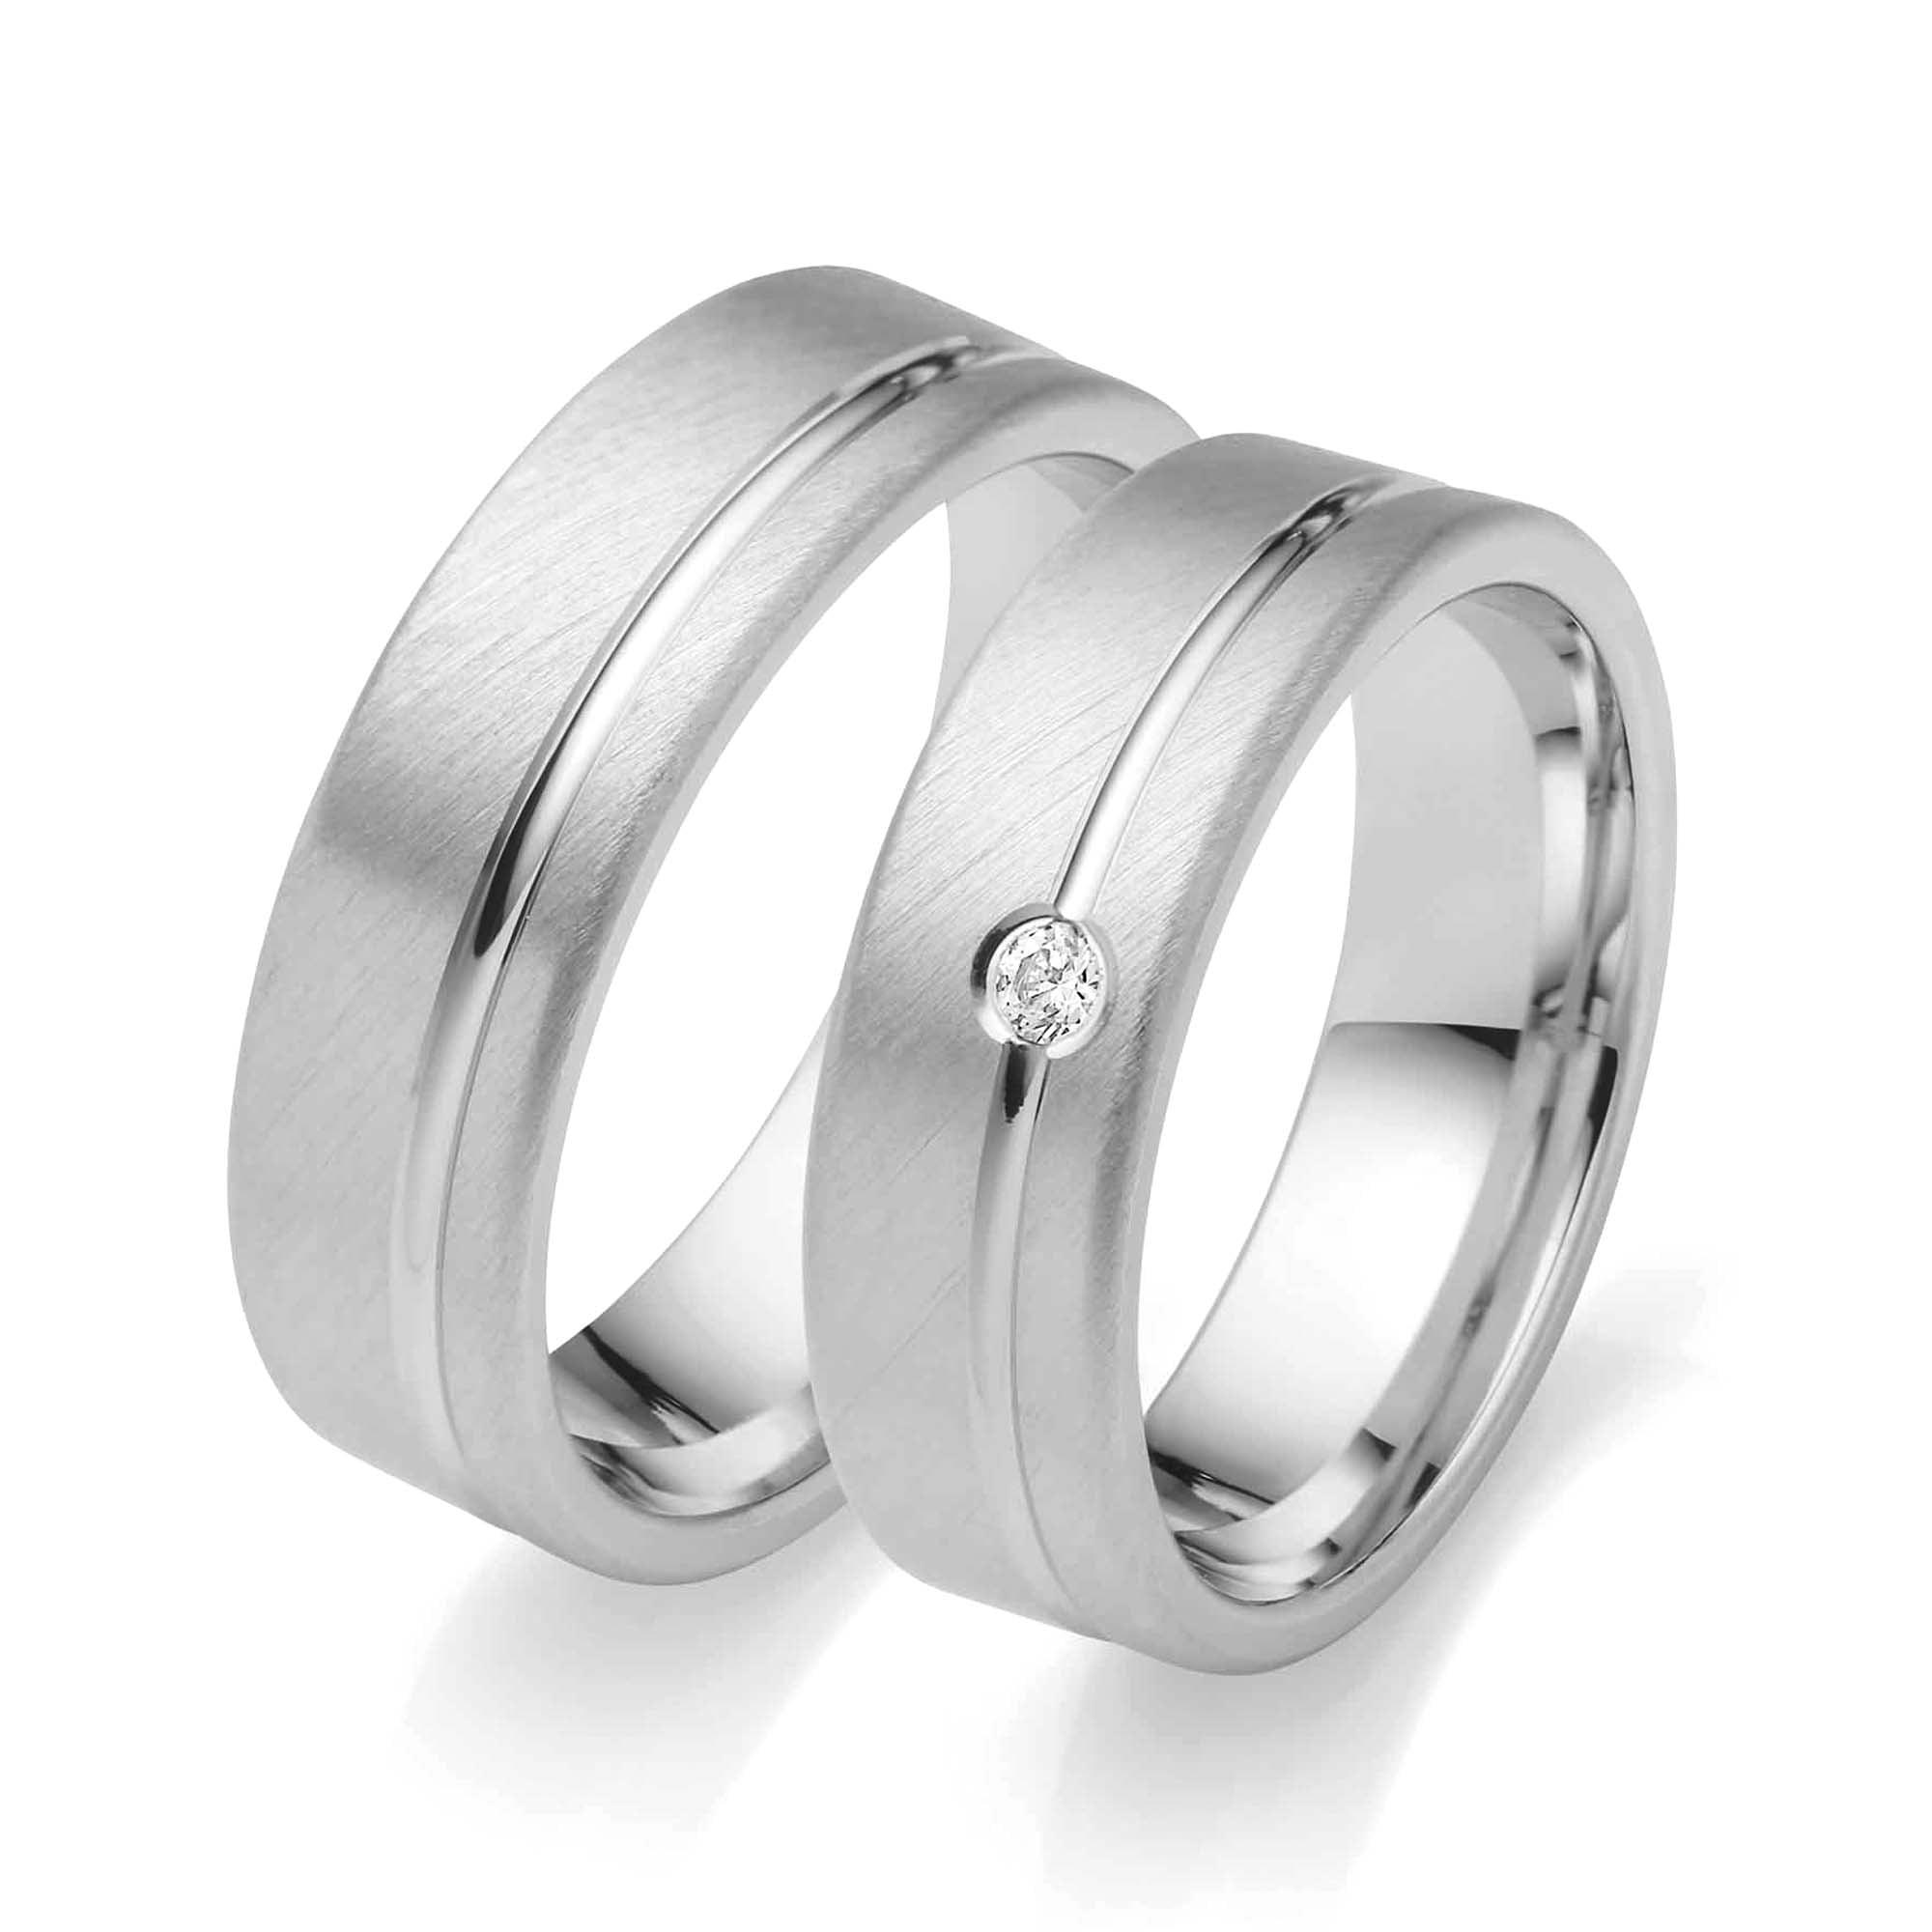 Juwelier Kraemer Freundschaftsringe 925 Silber 66 Mm Juwelier